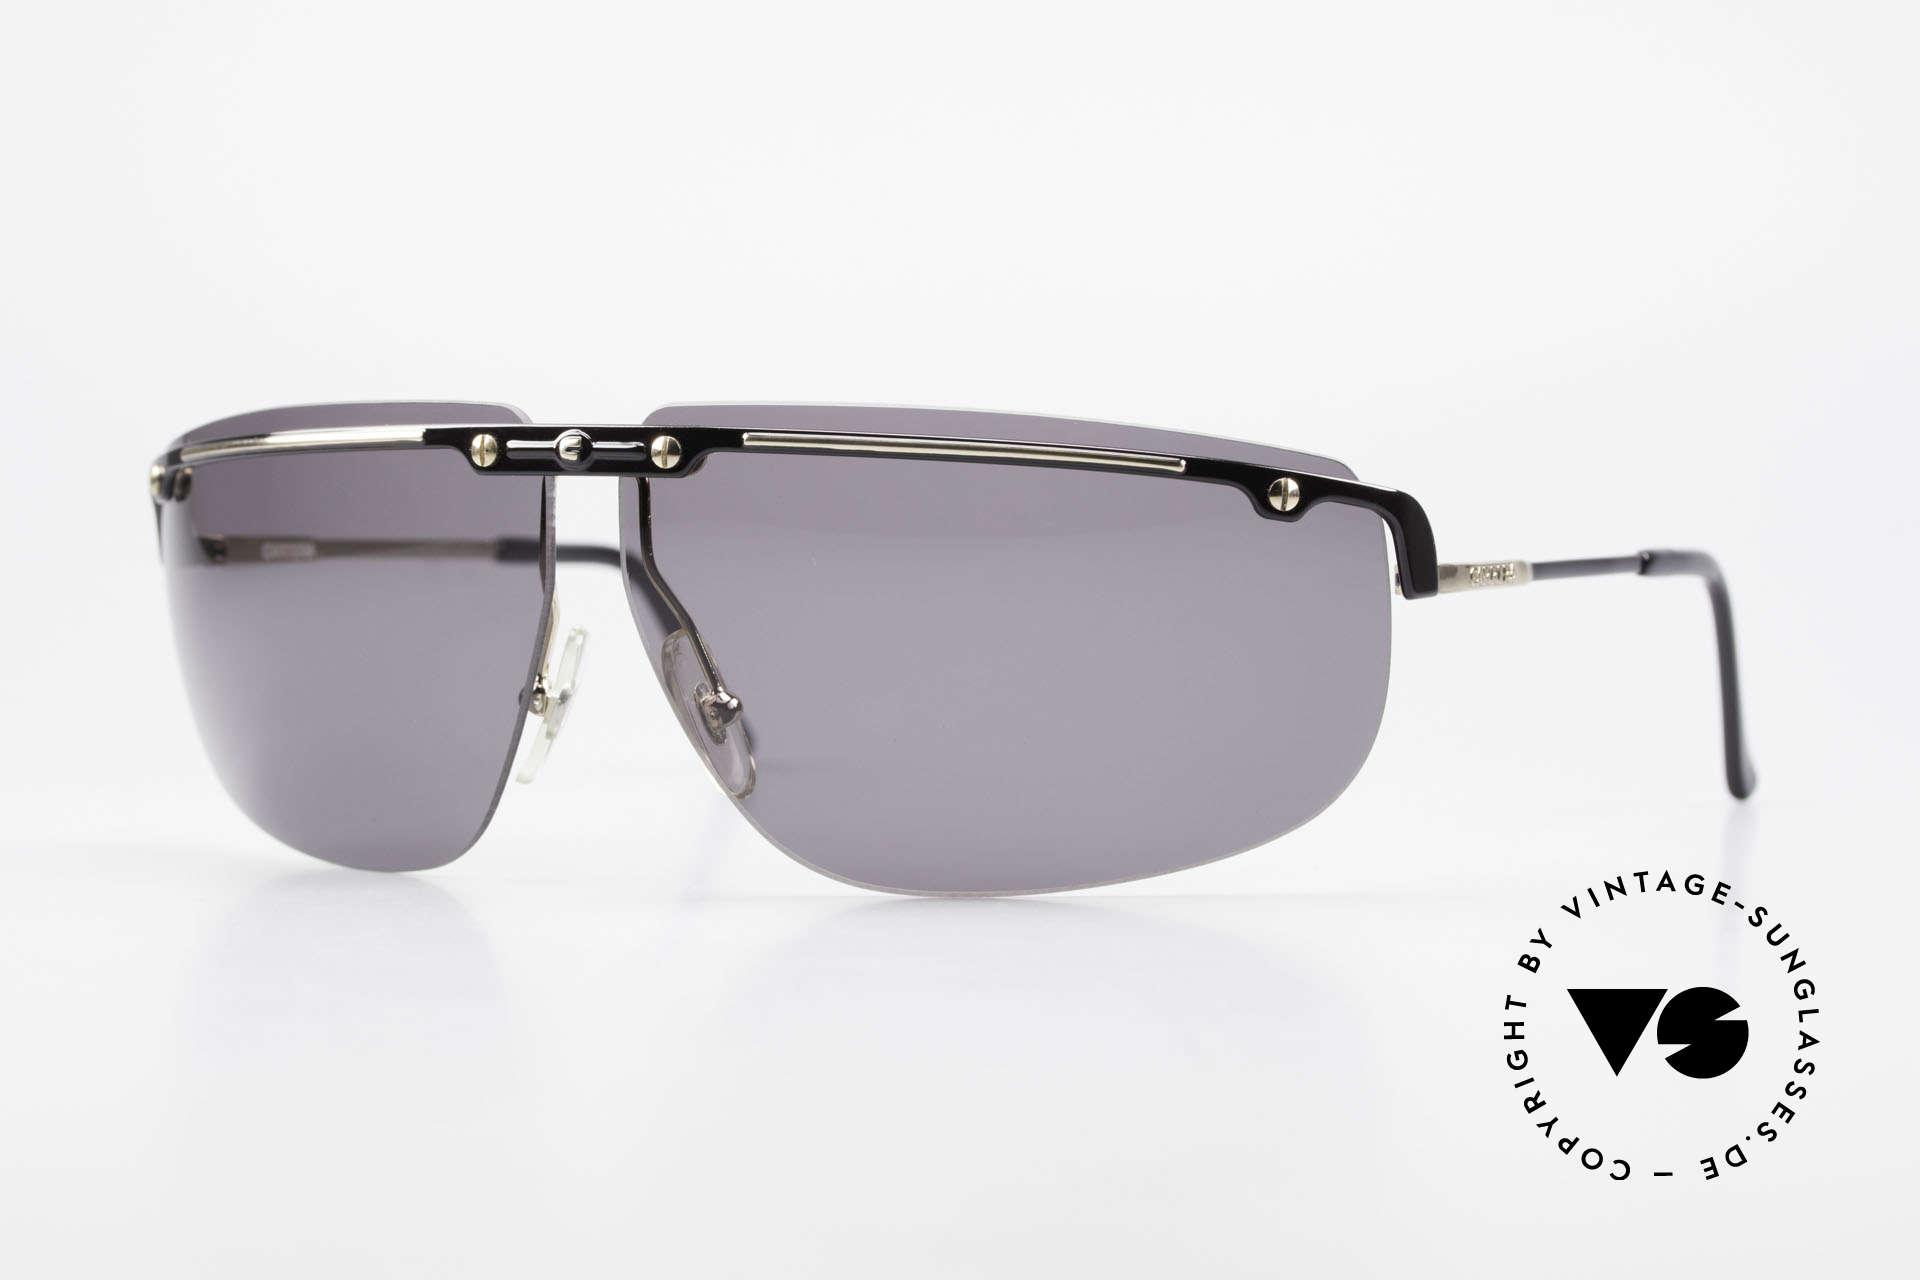 Carrera 5420 90s Wrap Around Sportsglasses, wrap around Carrera sports sunglasses from 1990, Made for Men